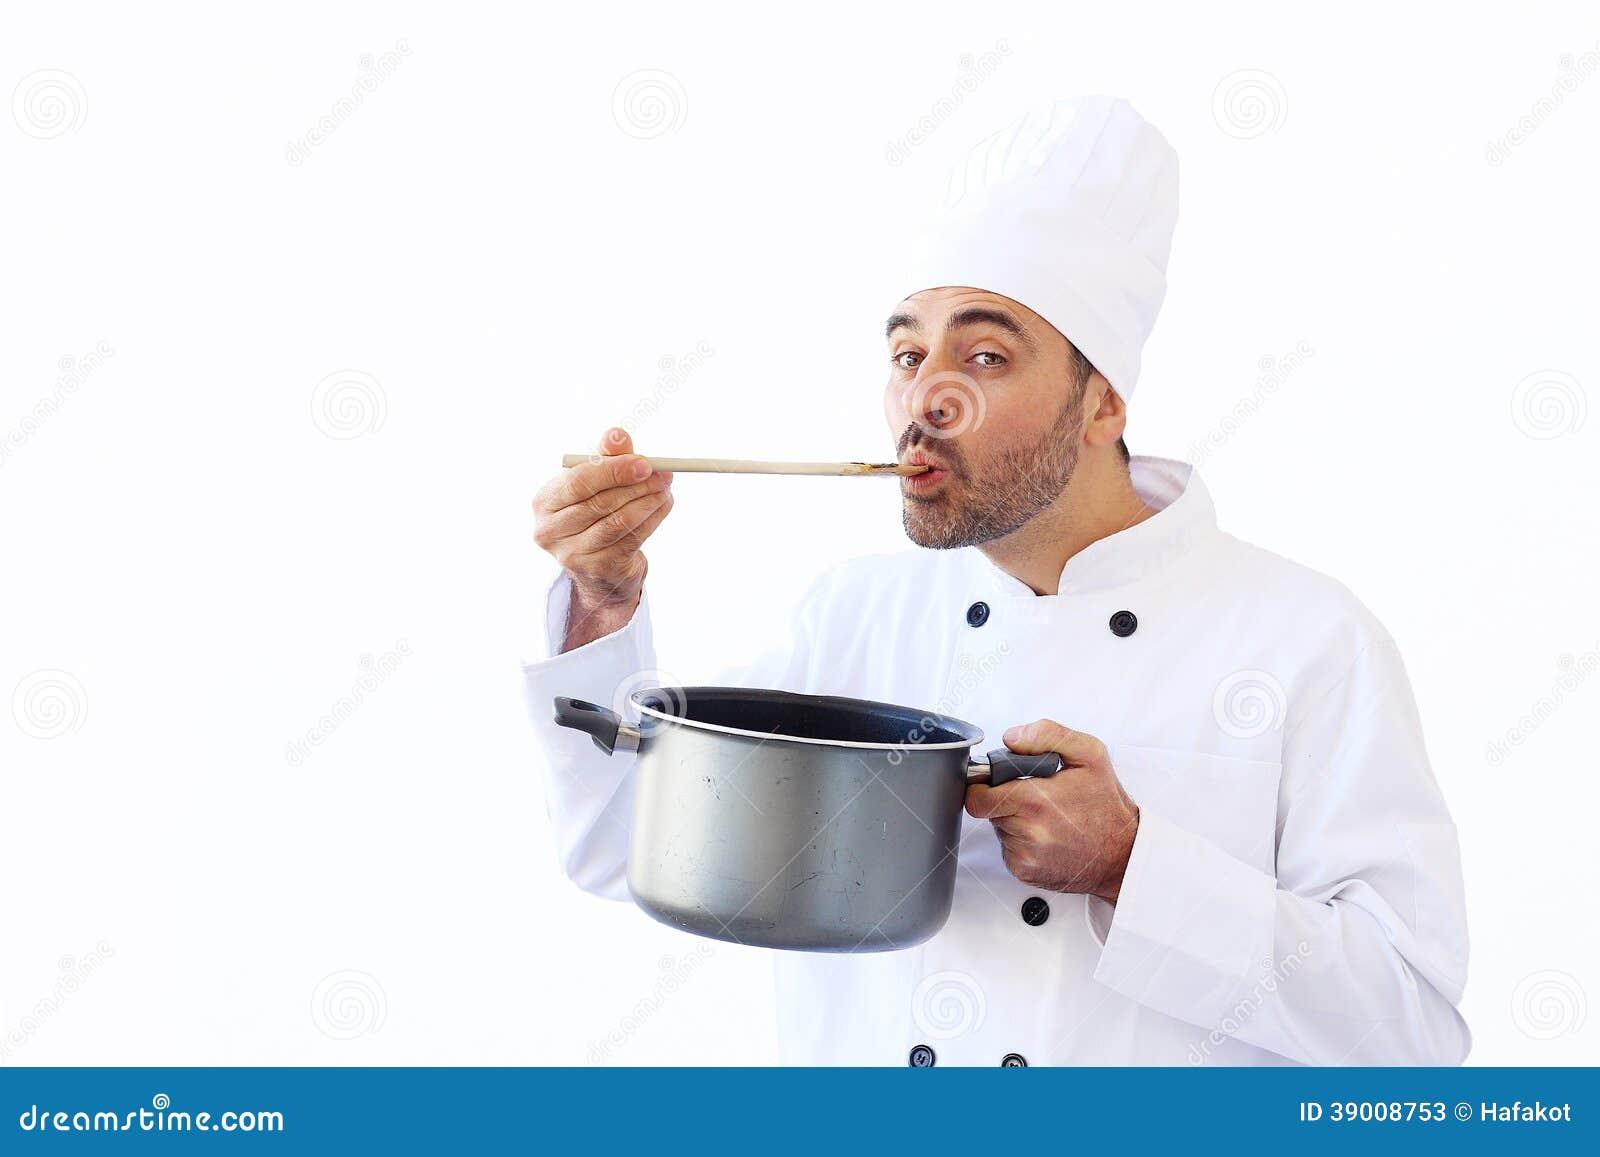 Gourmet Soup Kitchen